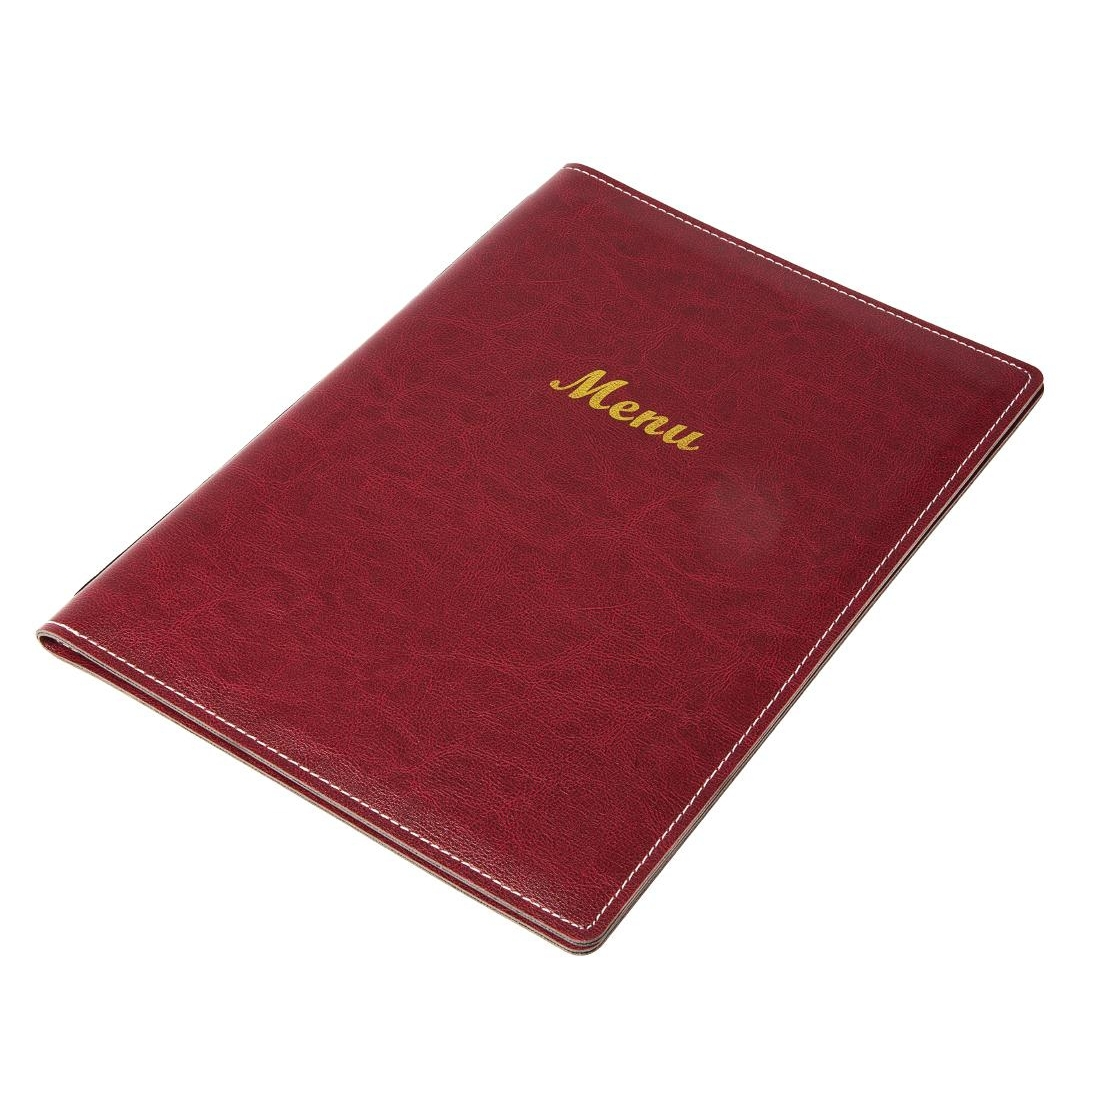 Protège-menus en simili cuir bordeaux A5